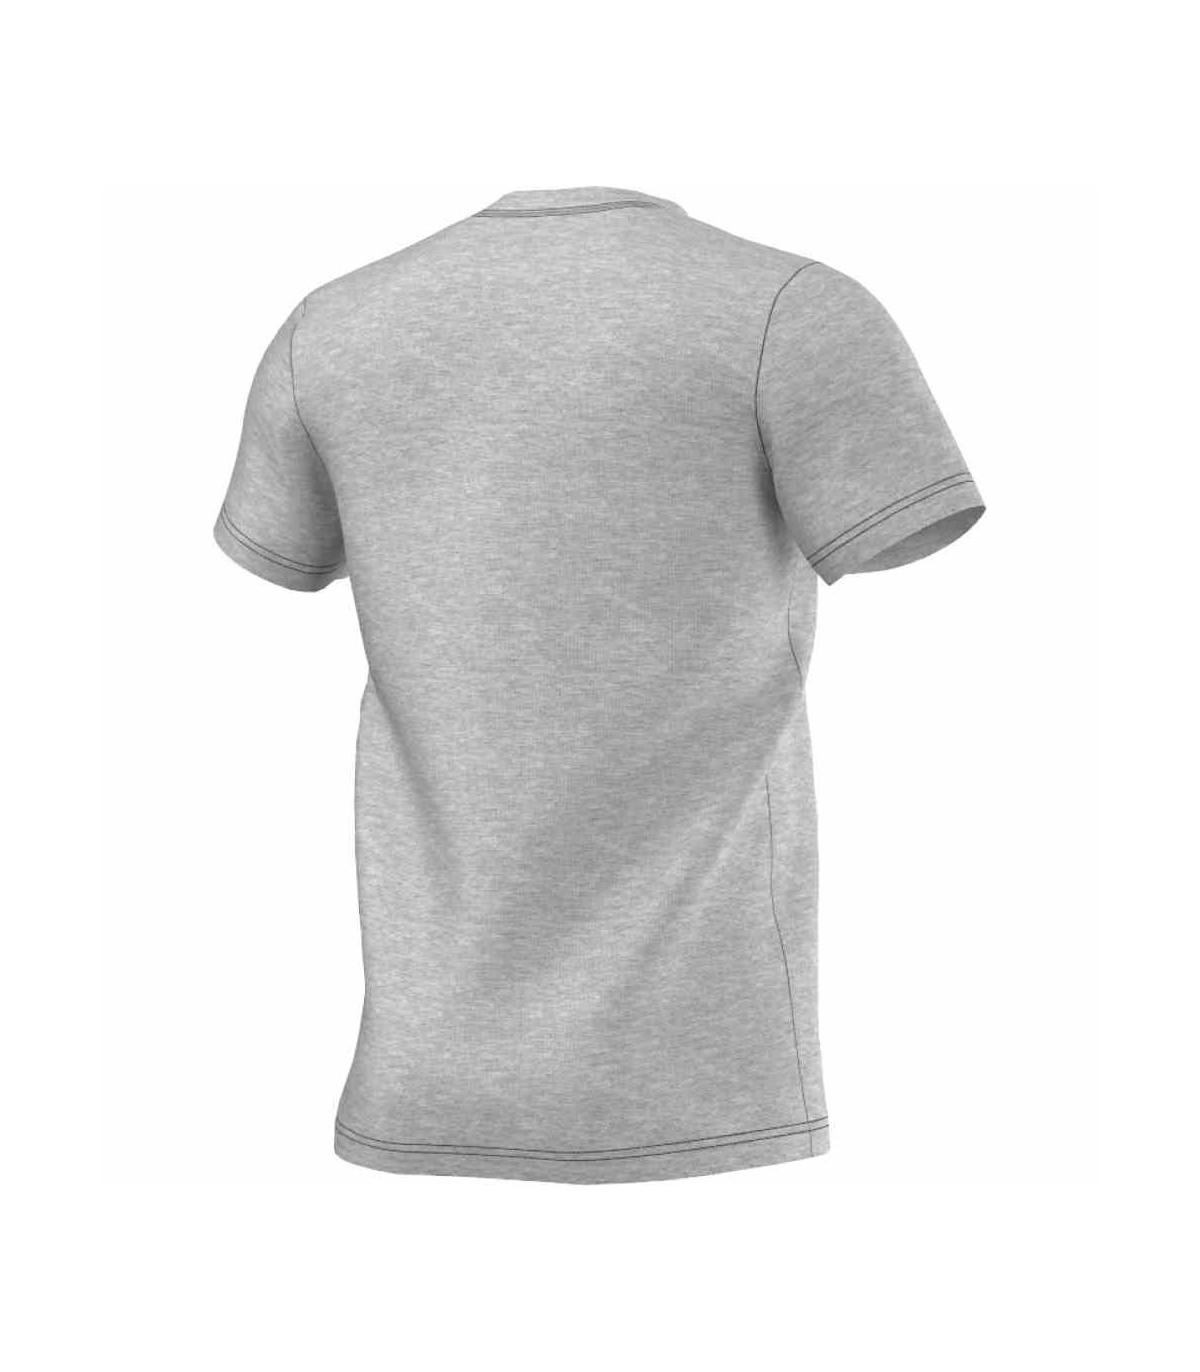 faabd47b9512 Adidas T-Shirt Ess Logo Men (Medium Grey Heather)